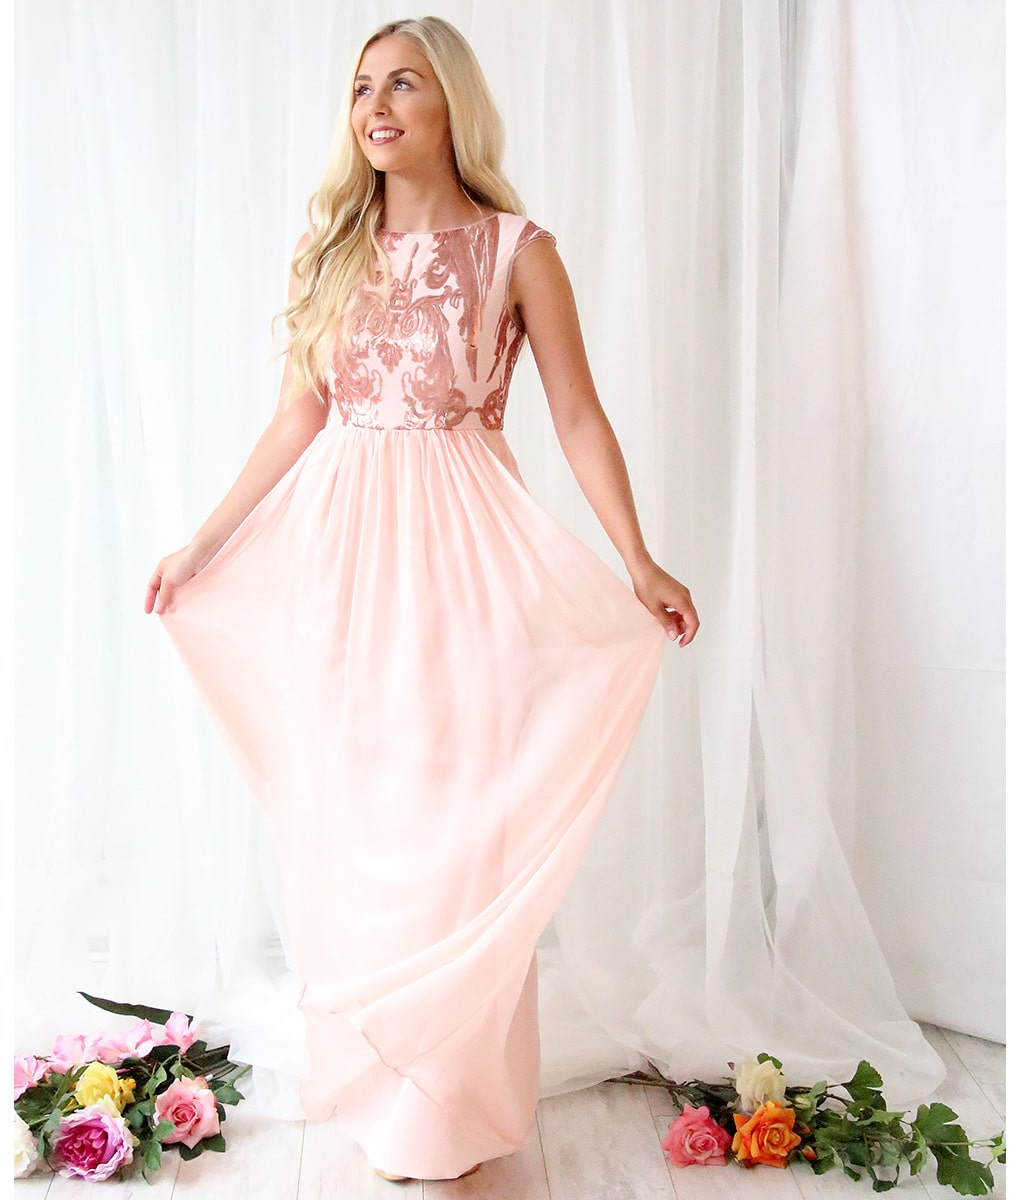 Alila-Blush-Chiffon-evening-long-gown-Bariano